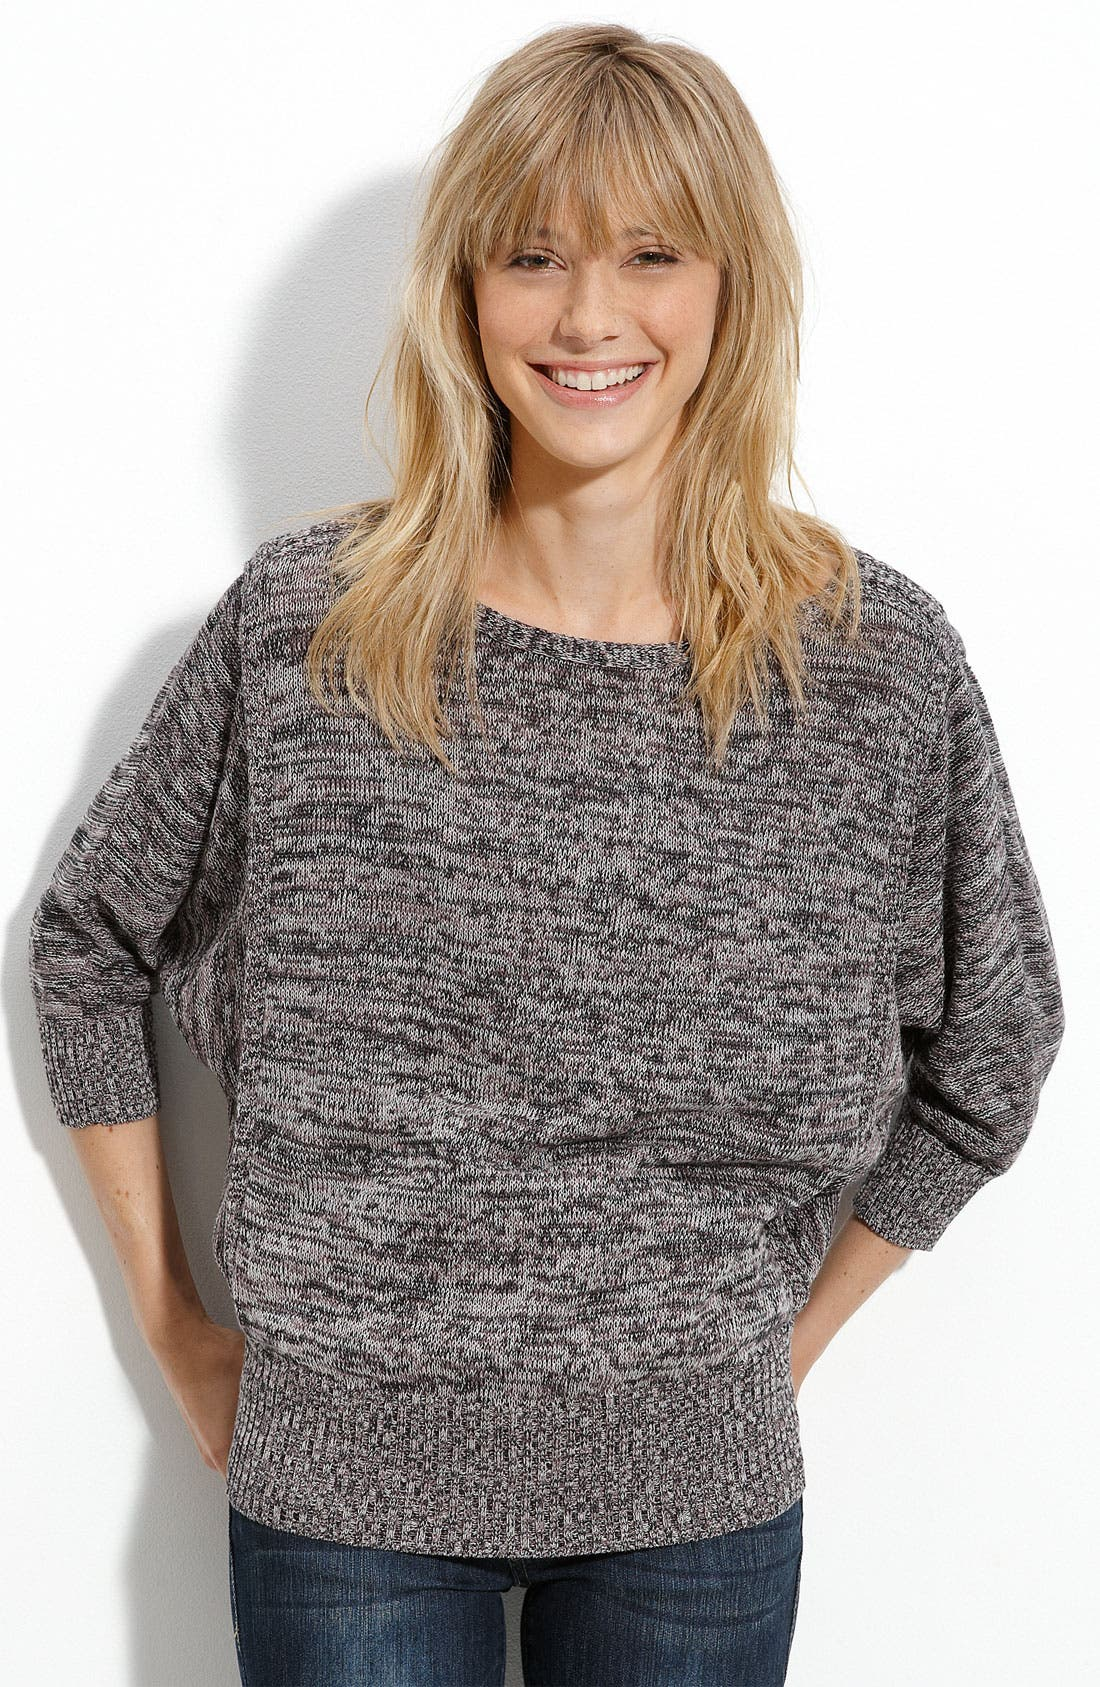 Alternate Image 1 Selected - Rubbish® Space Dye Dolman Sleeve Sweater (Juniors)